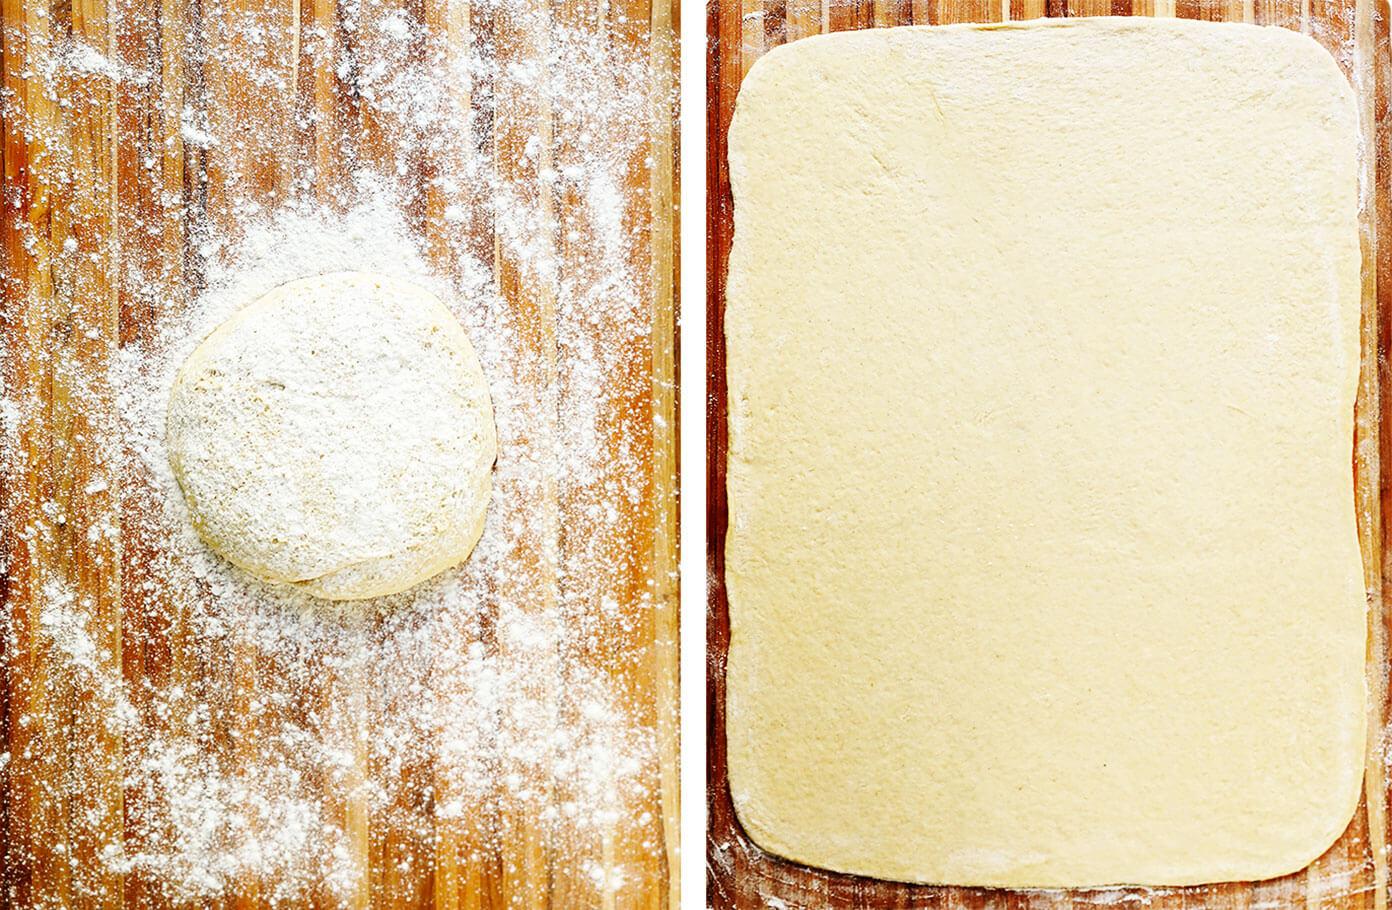 How To Make Swedish Cinnamon Bun Dough